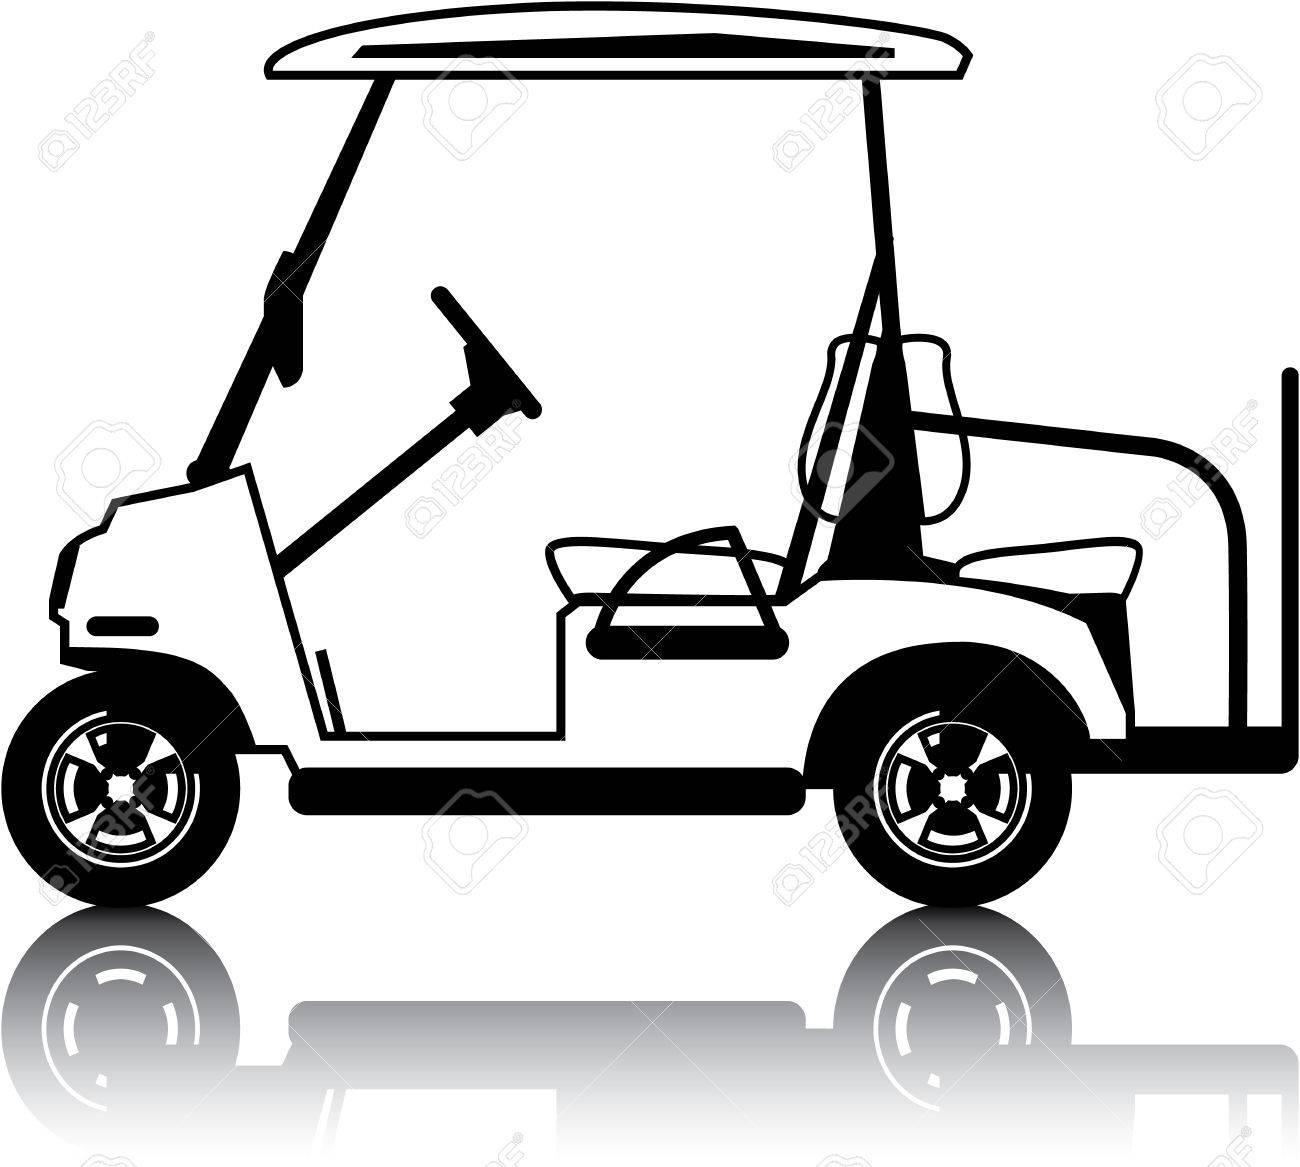 white golf cart vehicle clip art vector image royalty free cliparts rh 123rf com clipart golf cart images golf cart clip art cartoons